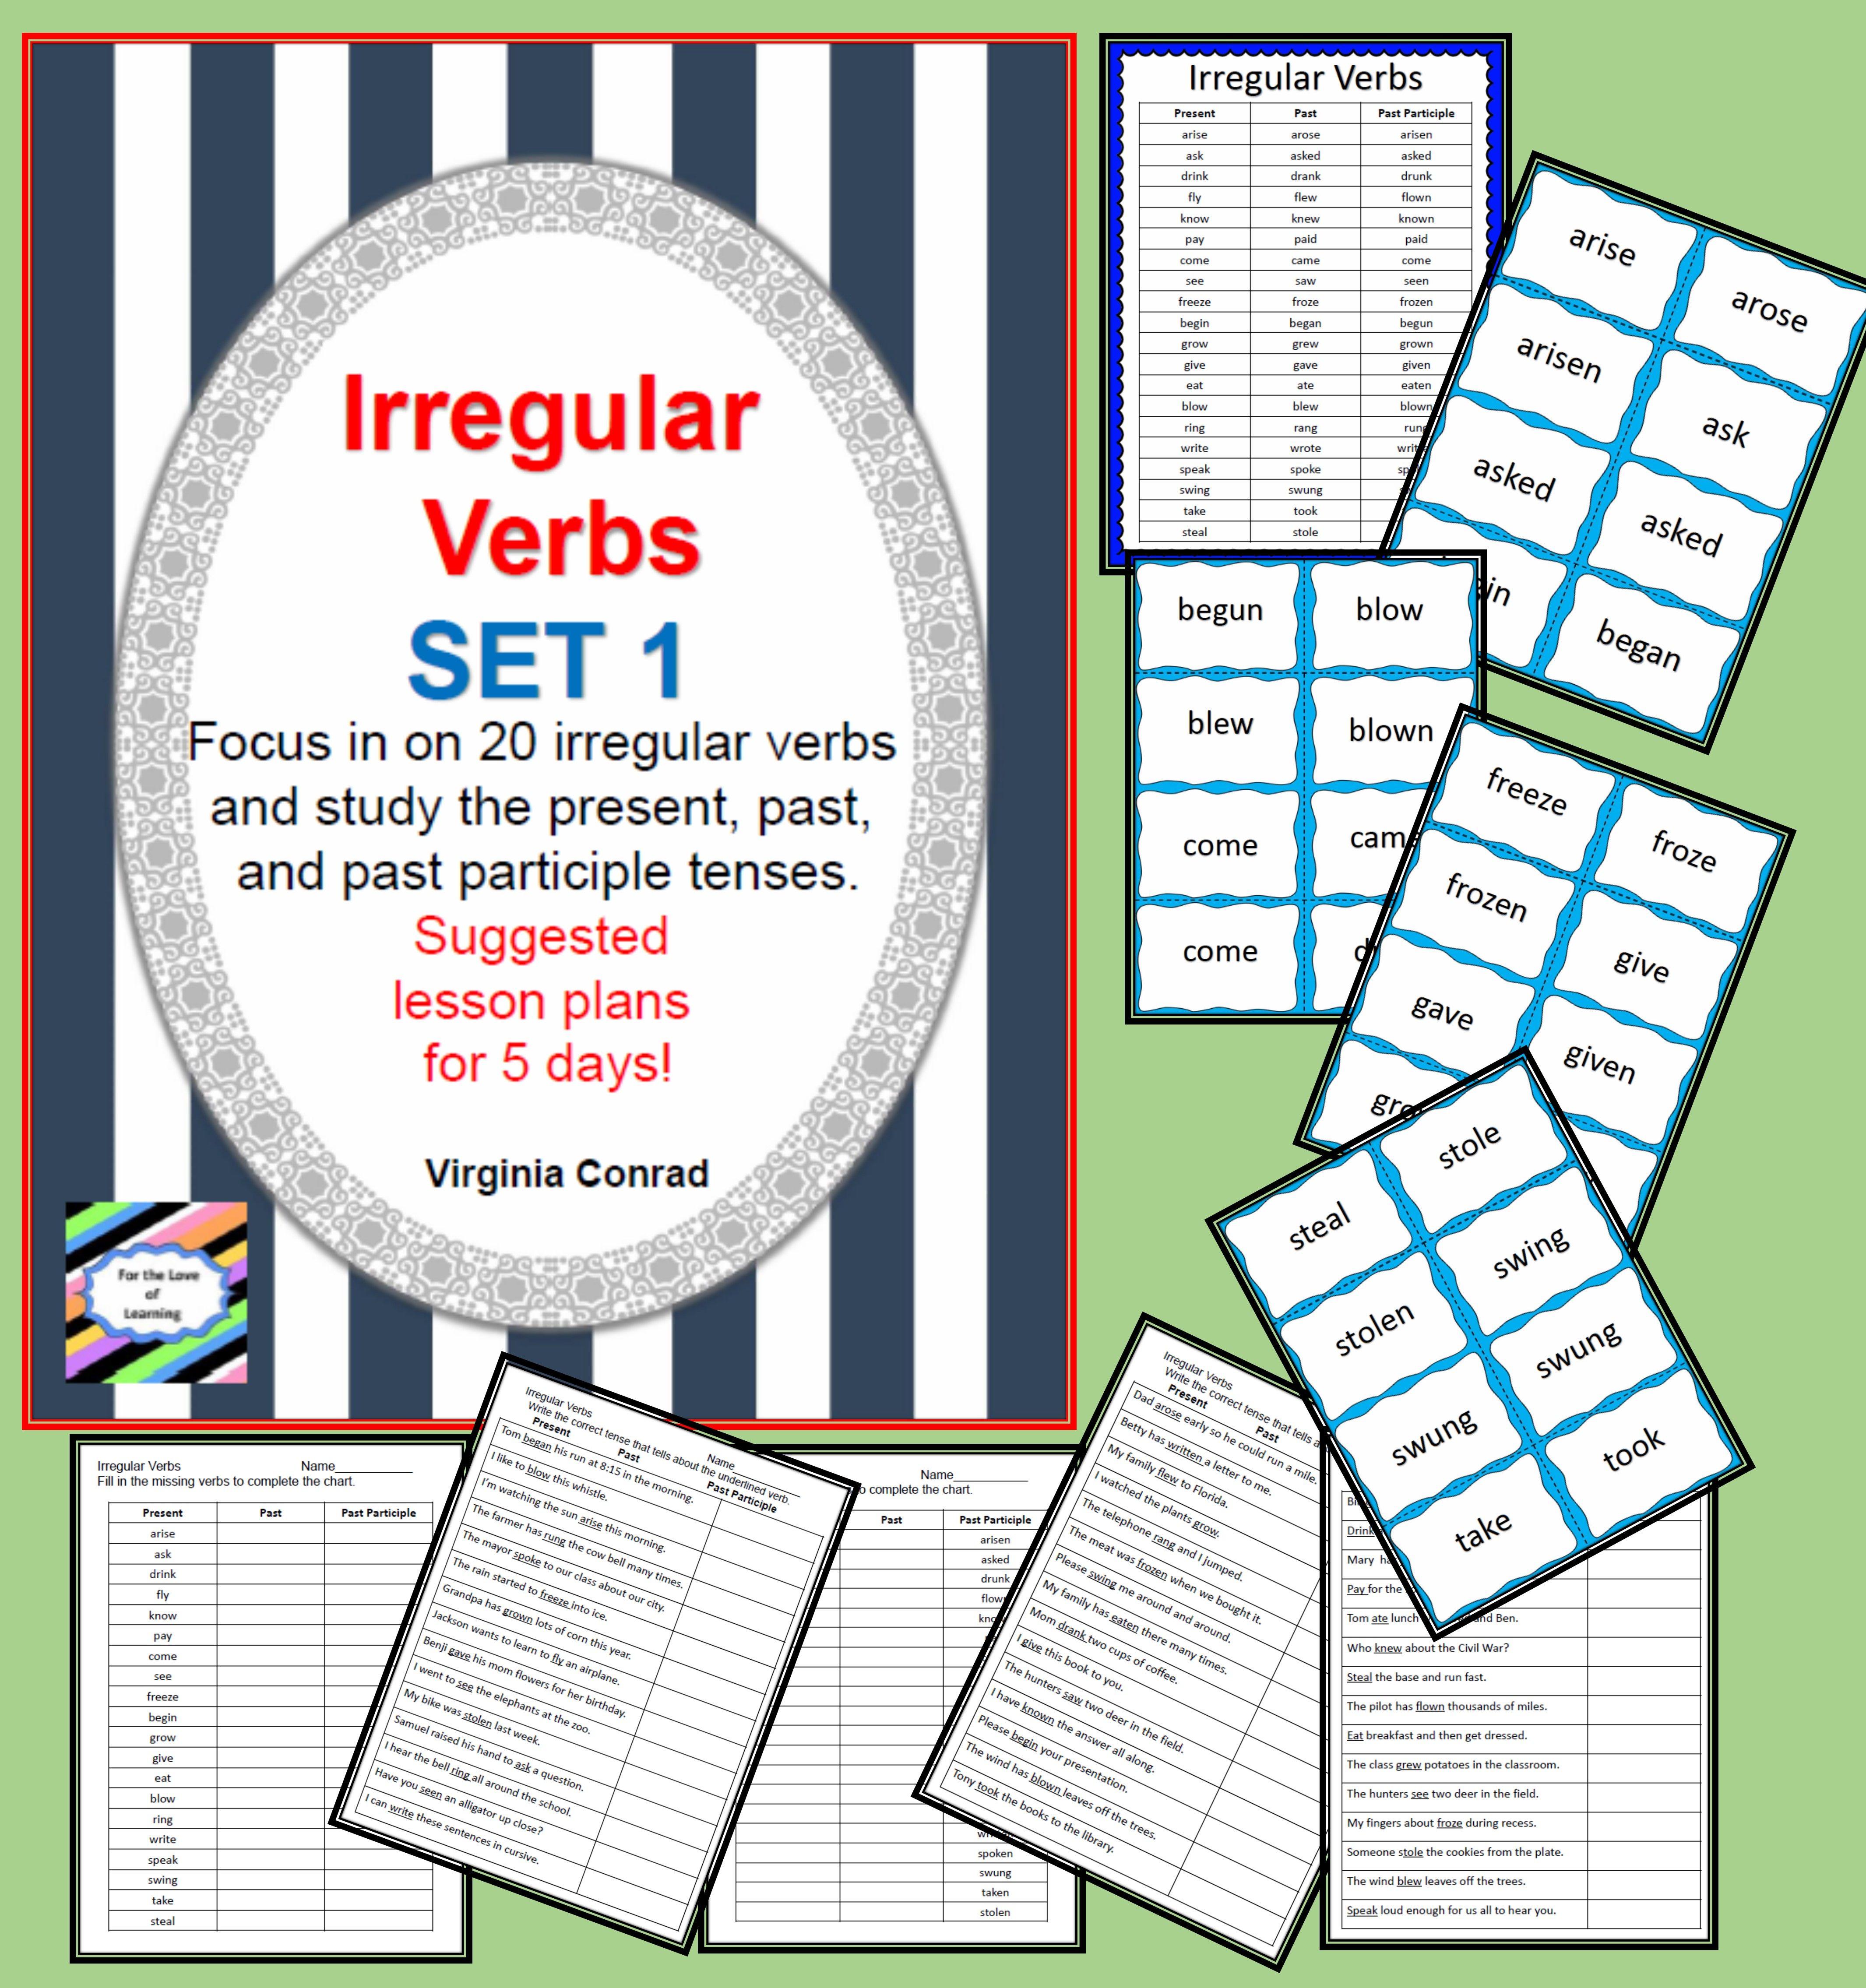 Irregular Verbs Set 1